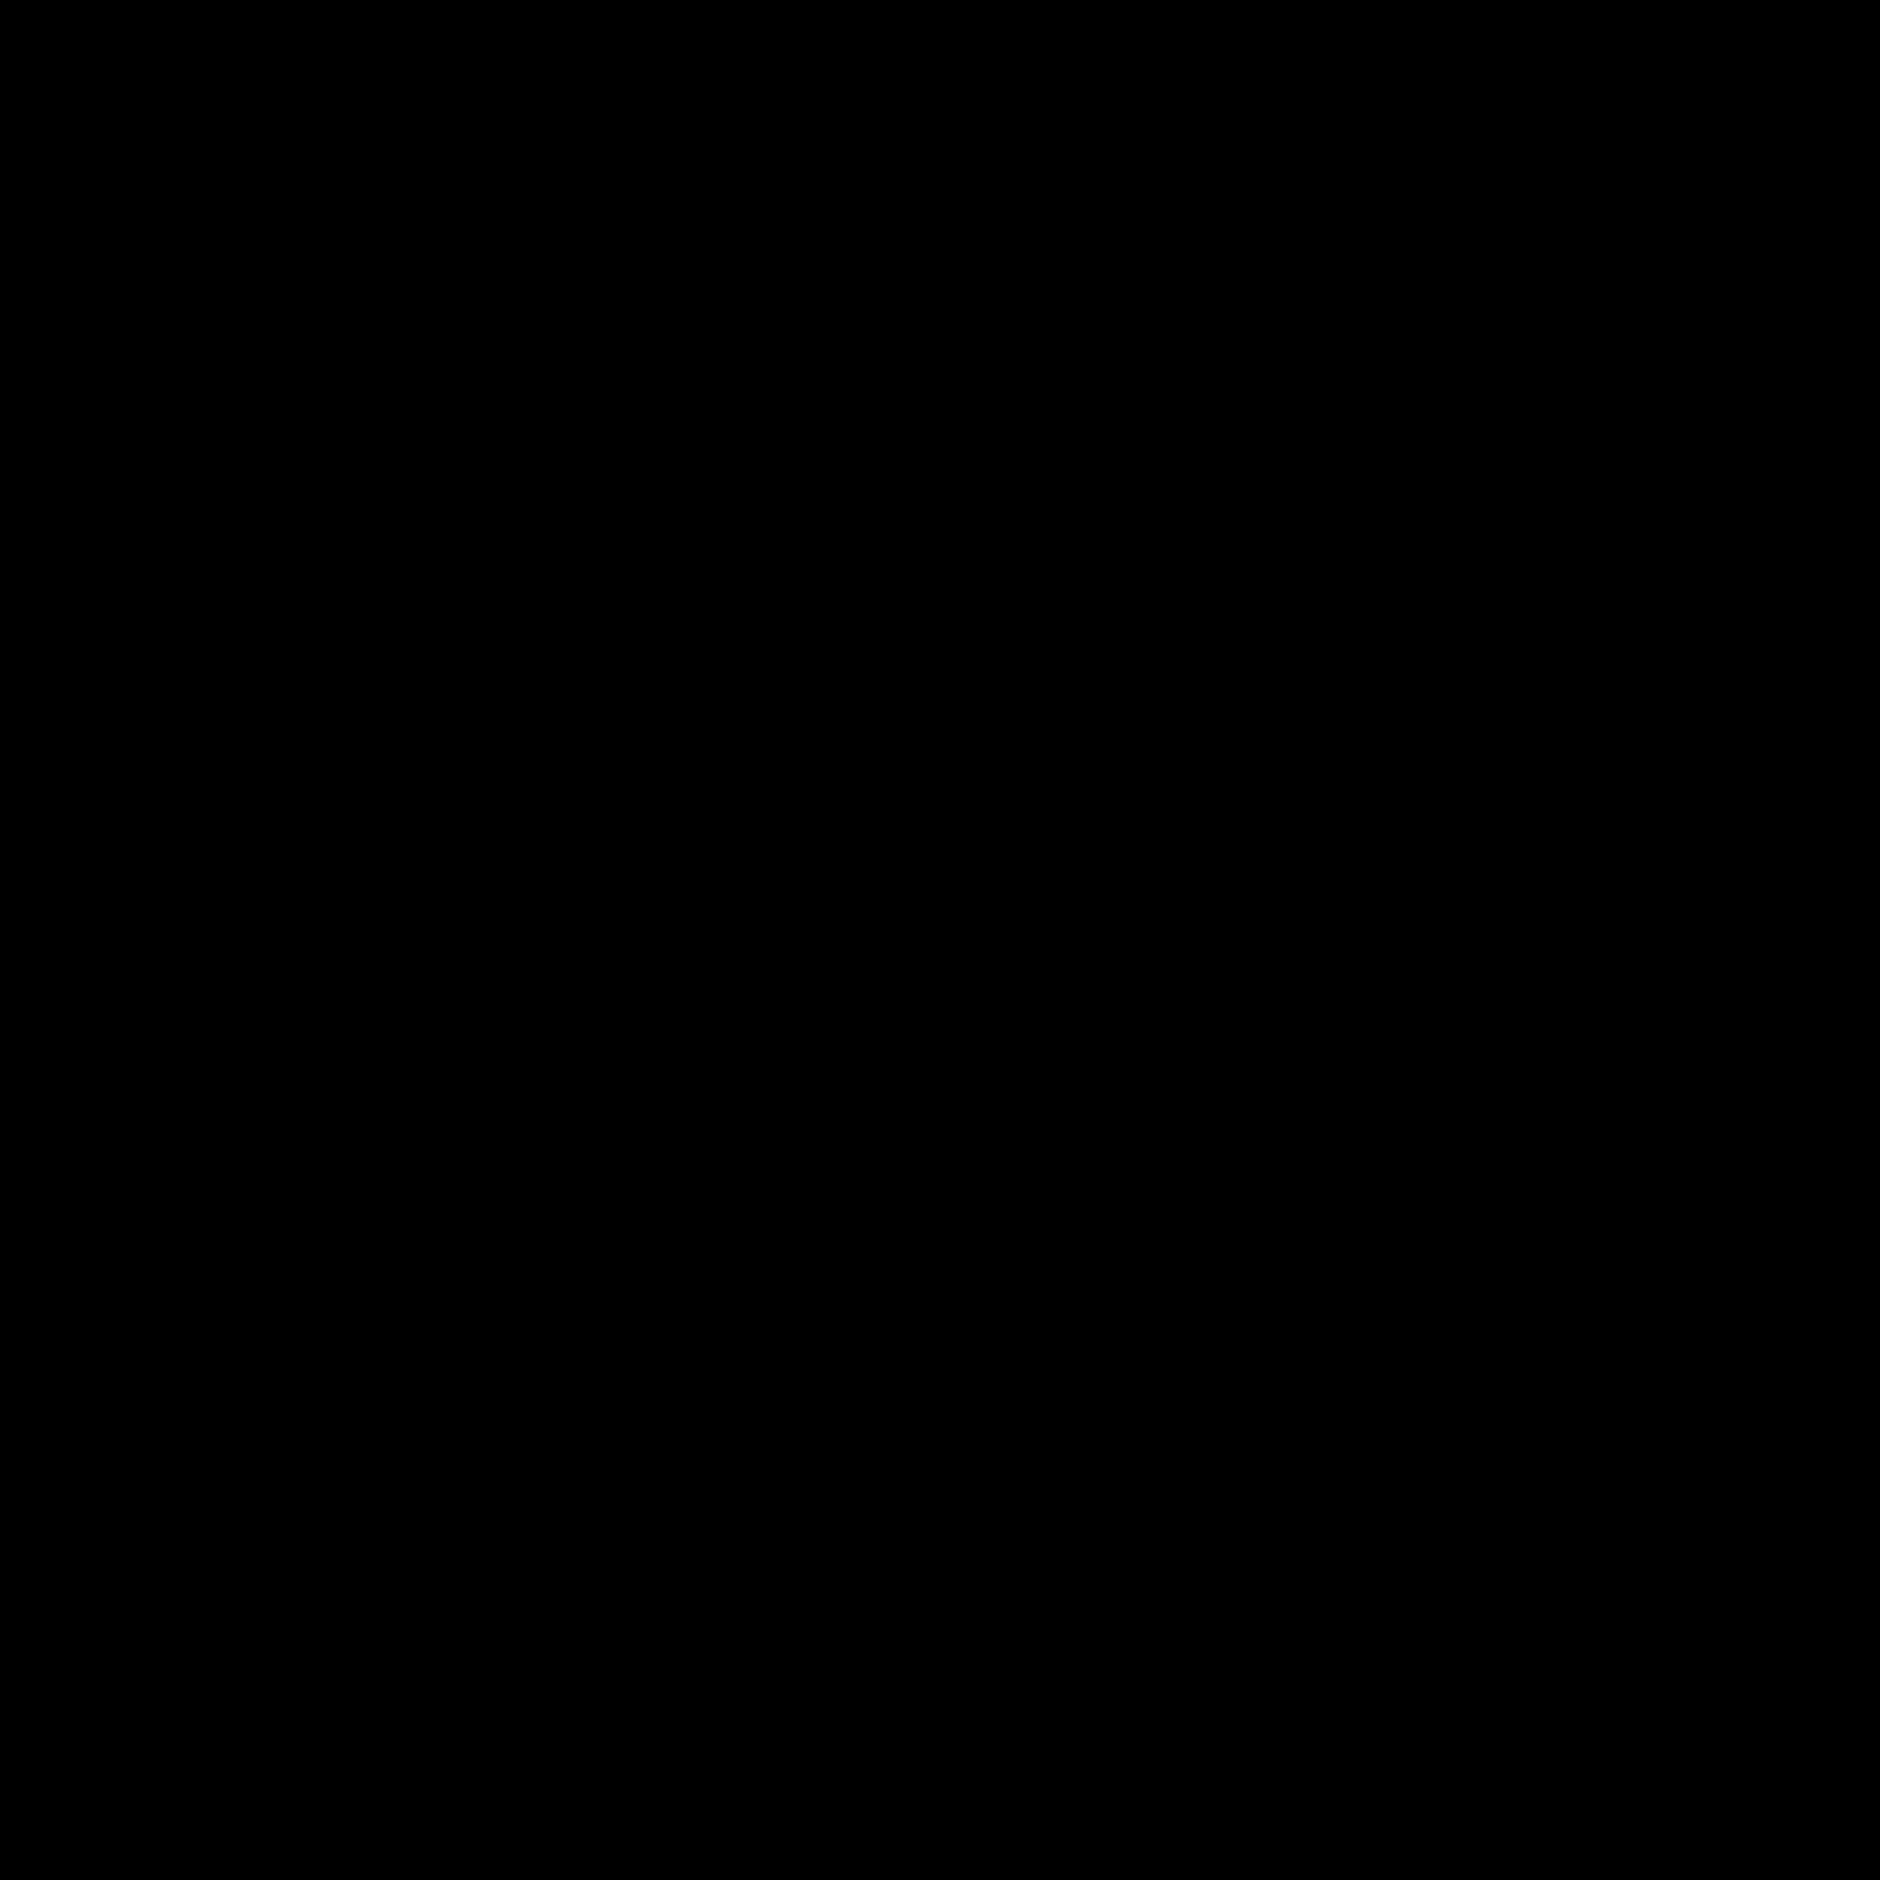 logo easy mobility challenge